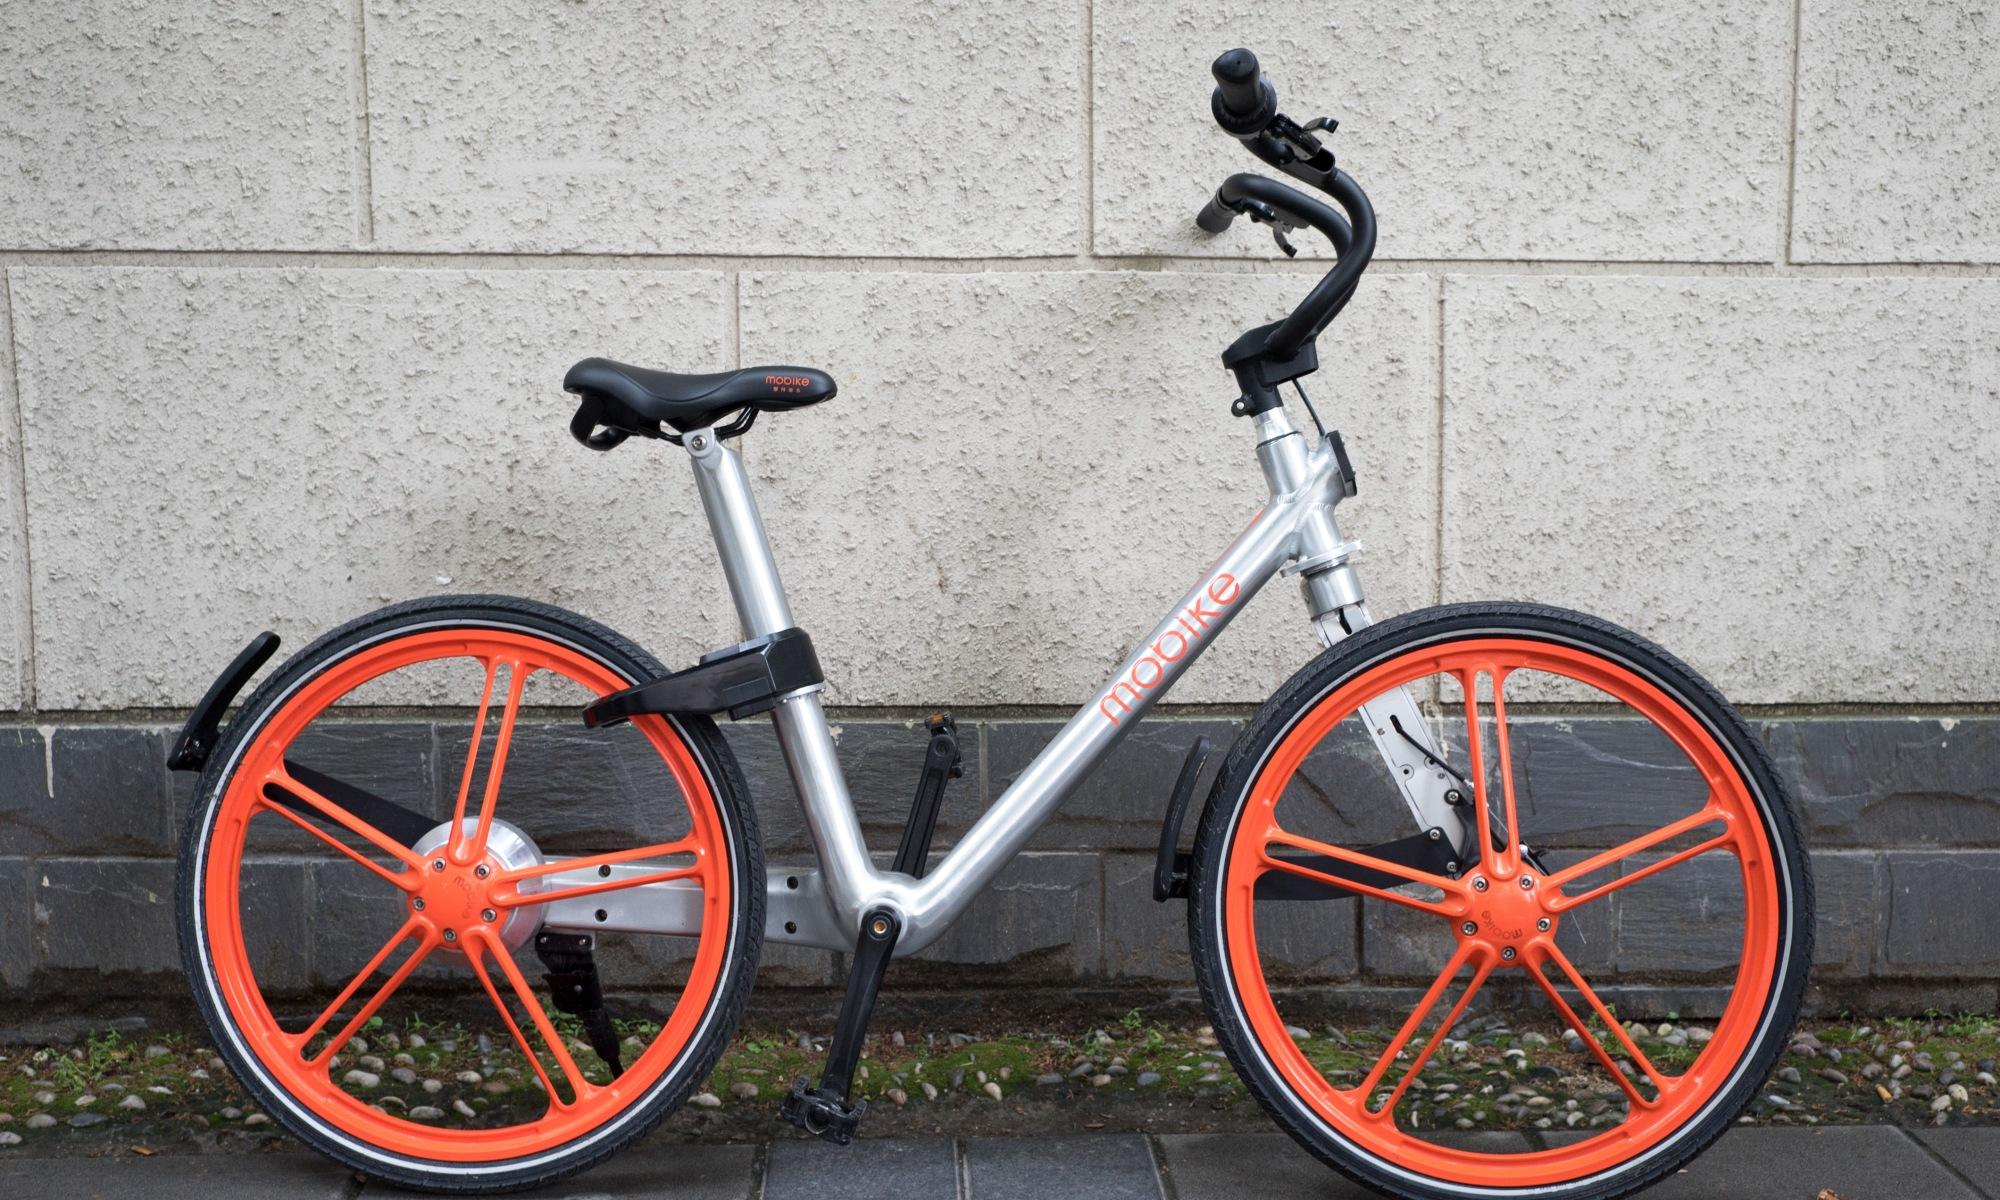 Mobike Shanghai Bike Sharing Service QR Code Davis Wang Left Fork WeChat Frame Lock Shaft Drive